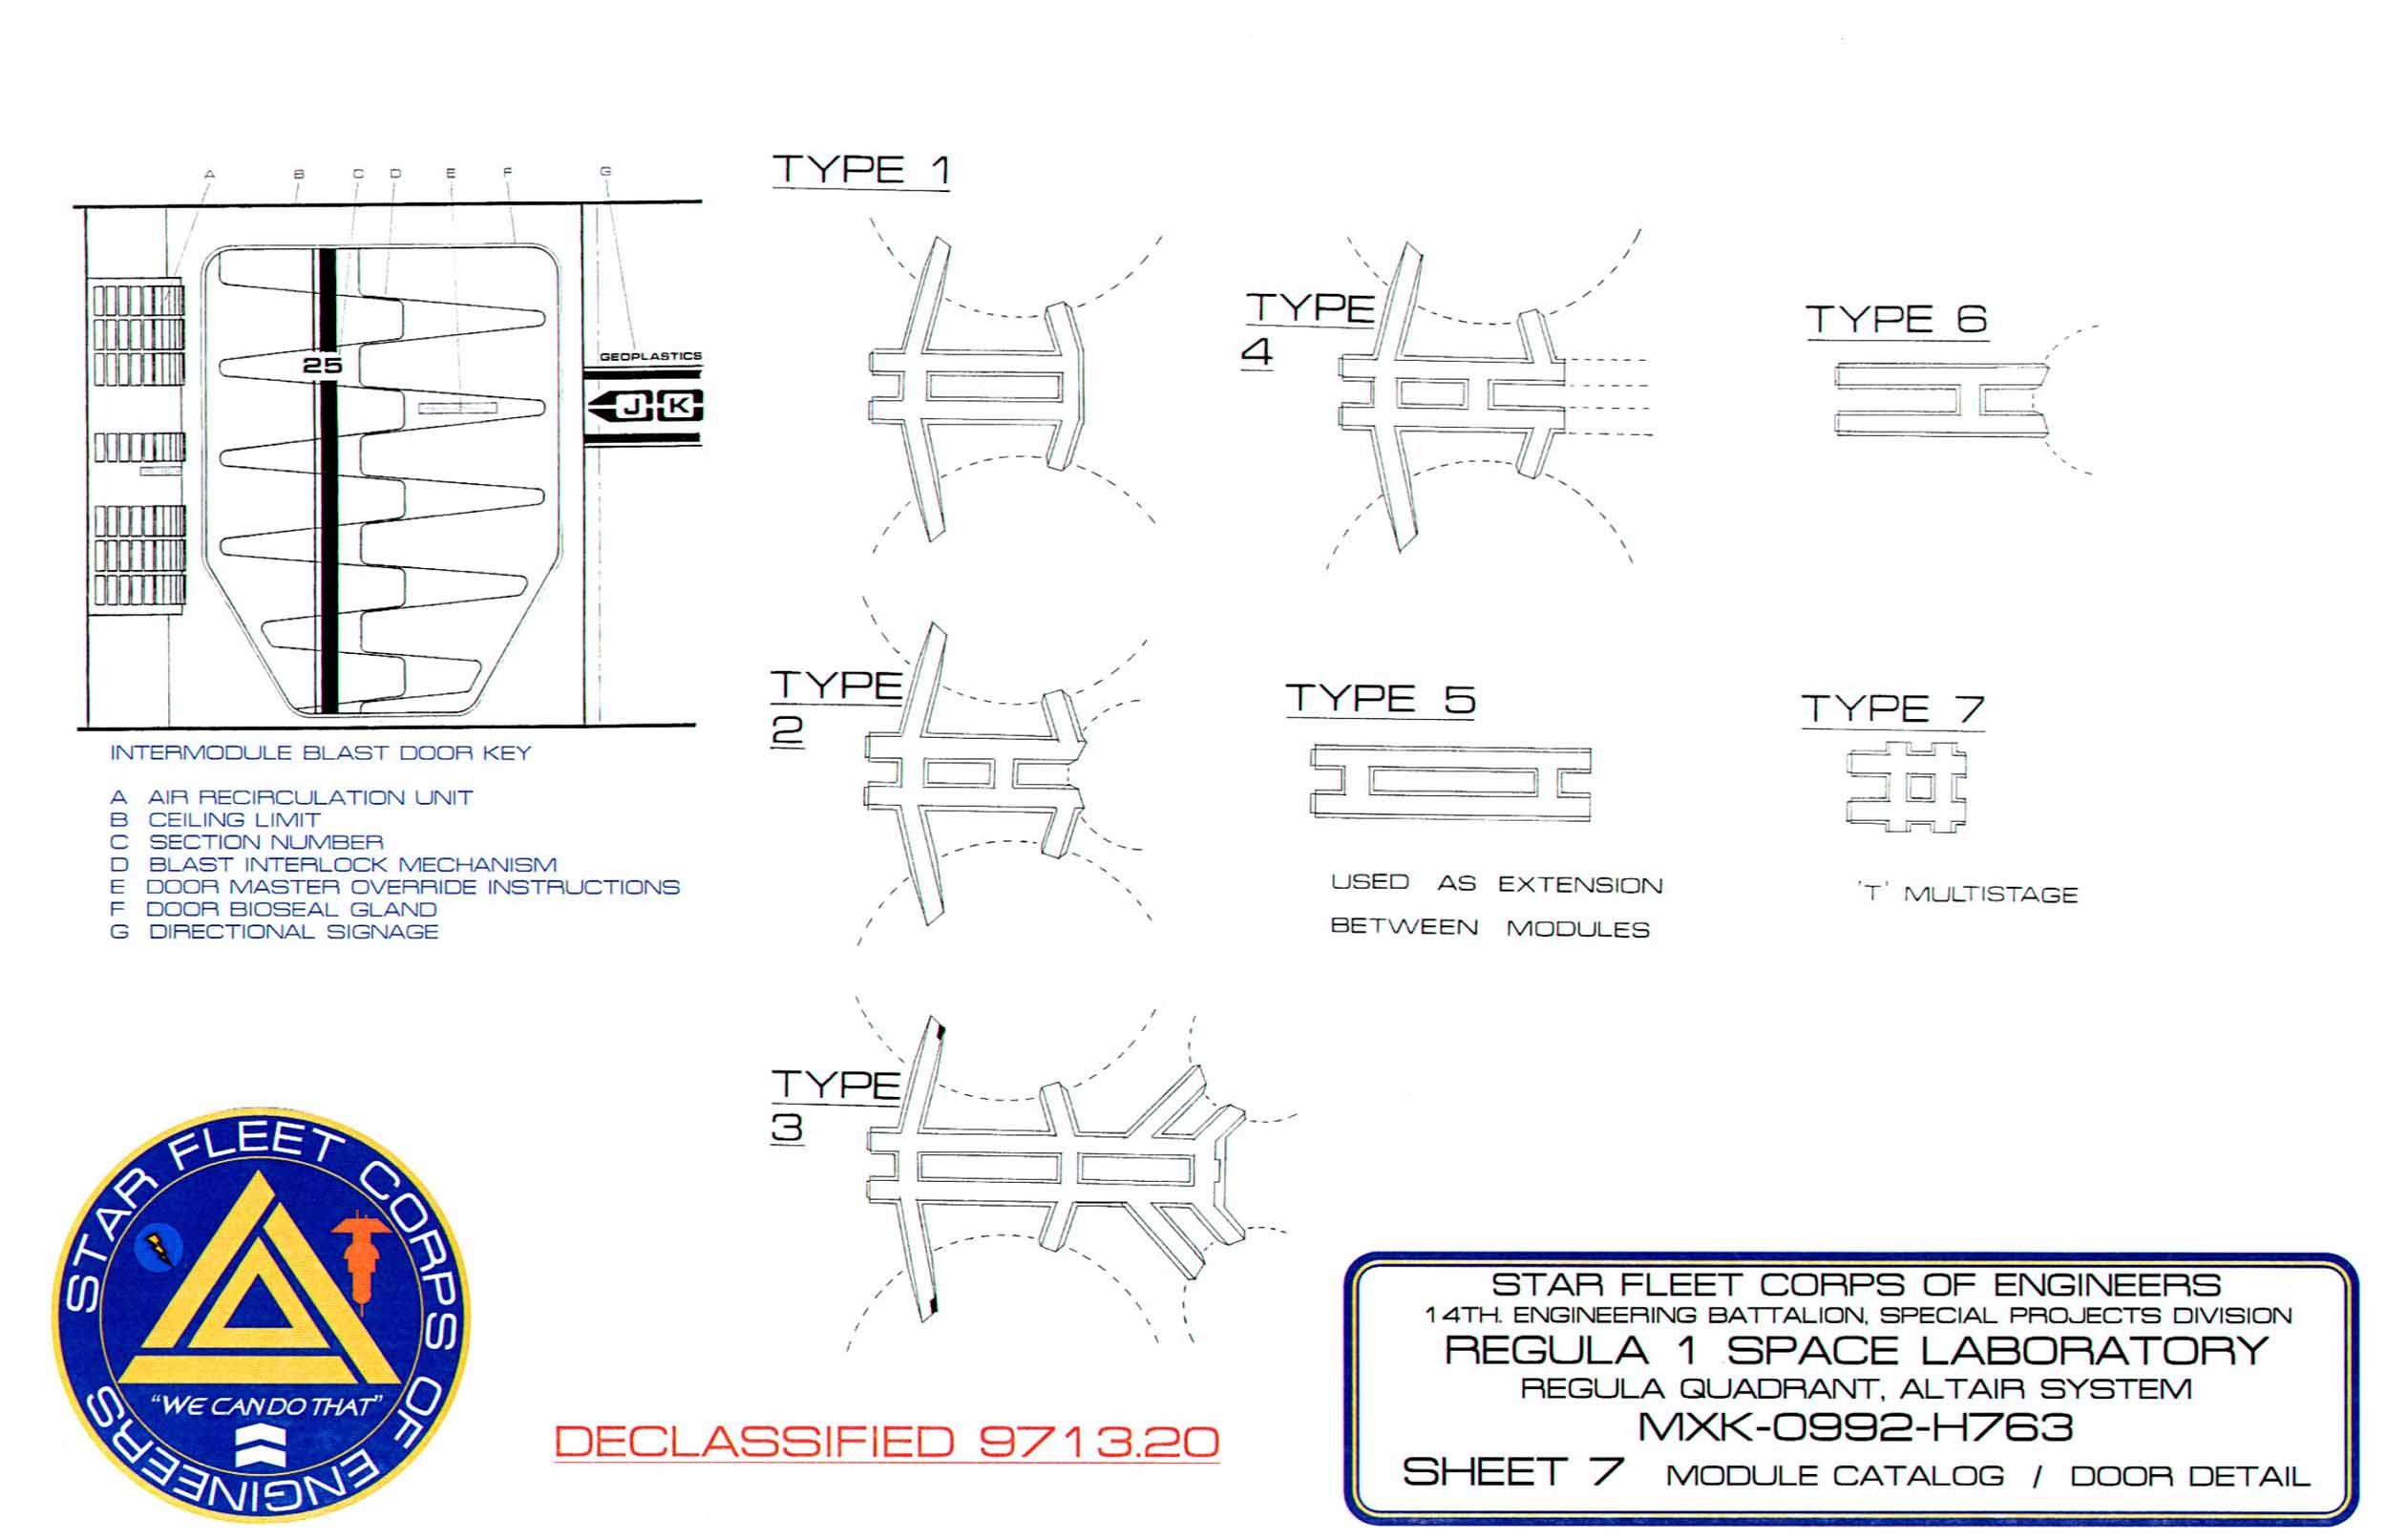 spacelaboratoryregula1sheet7.jpg